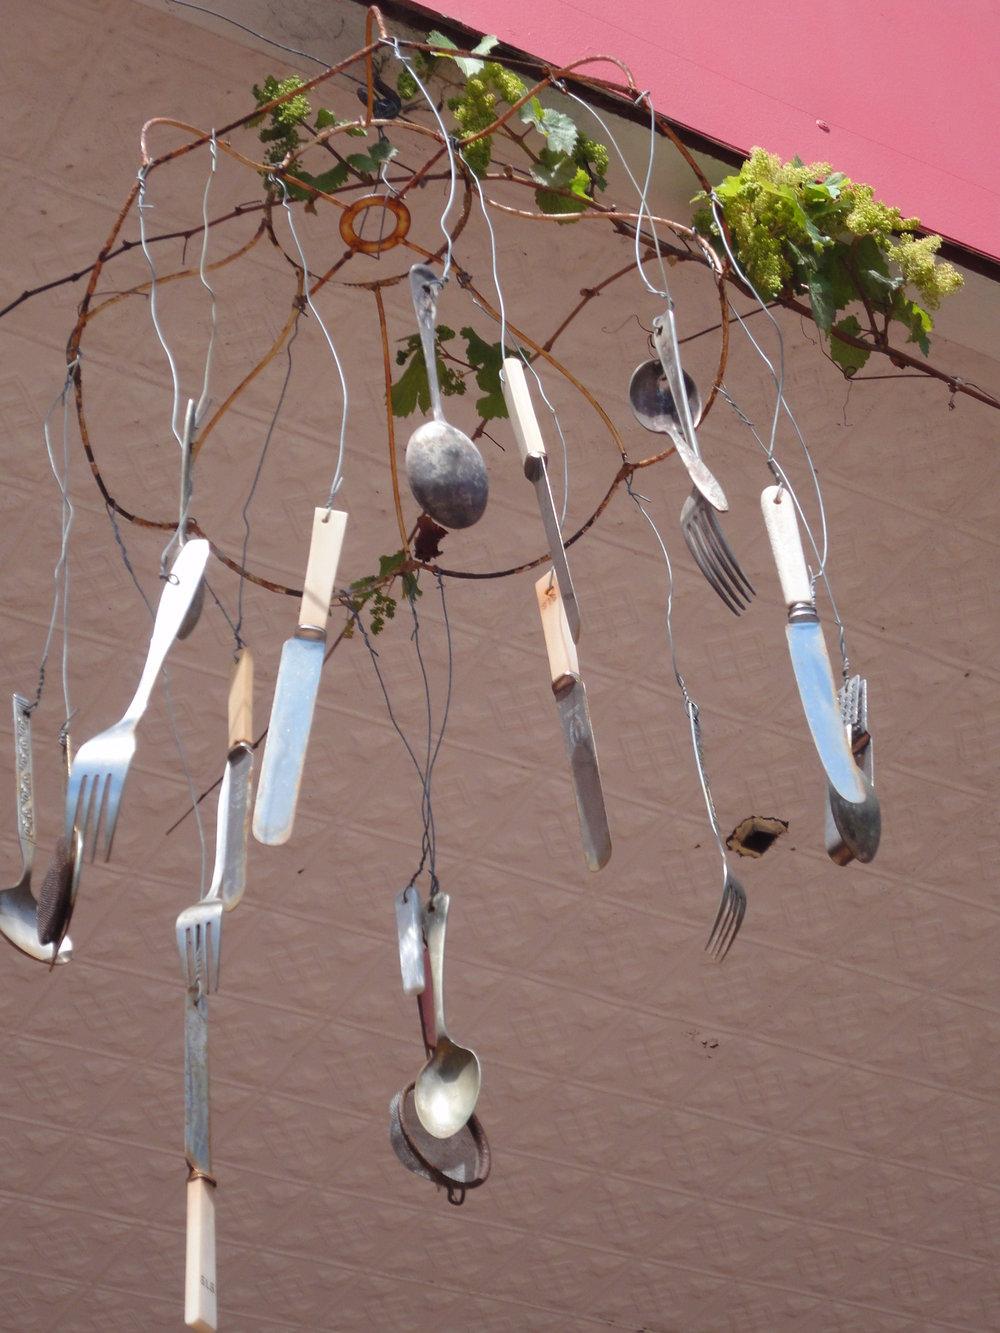 Heartfelt food vegan gluten free Kaniva Victoria Australia travel roadtrip road travel salad coffee